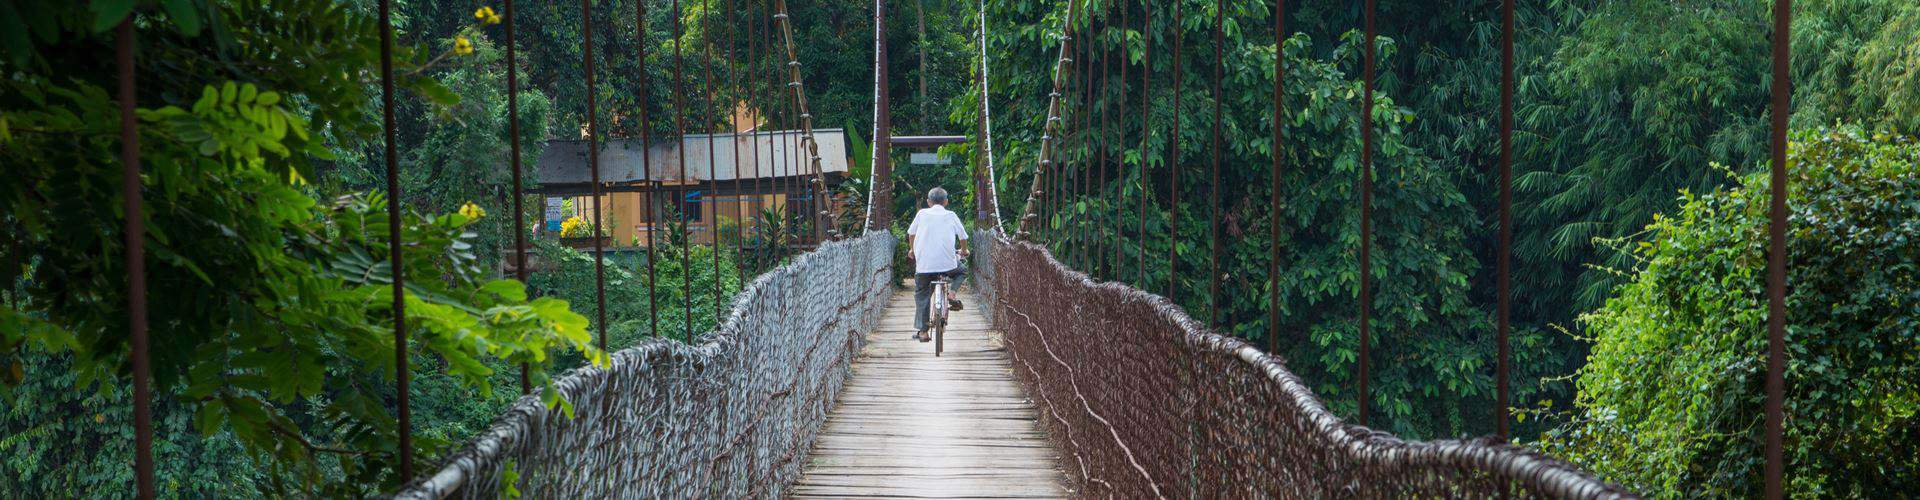 Indonesia-bali-attraction